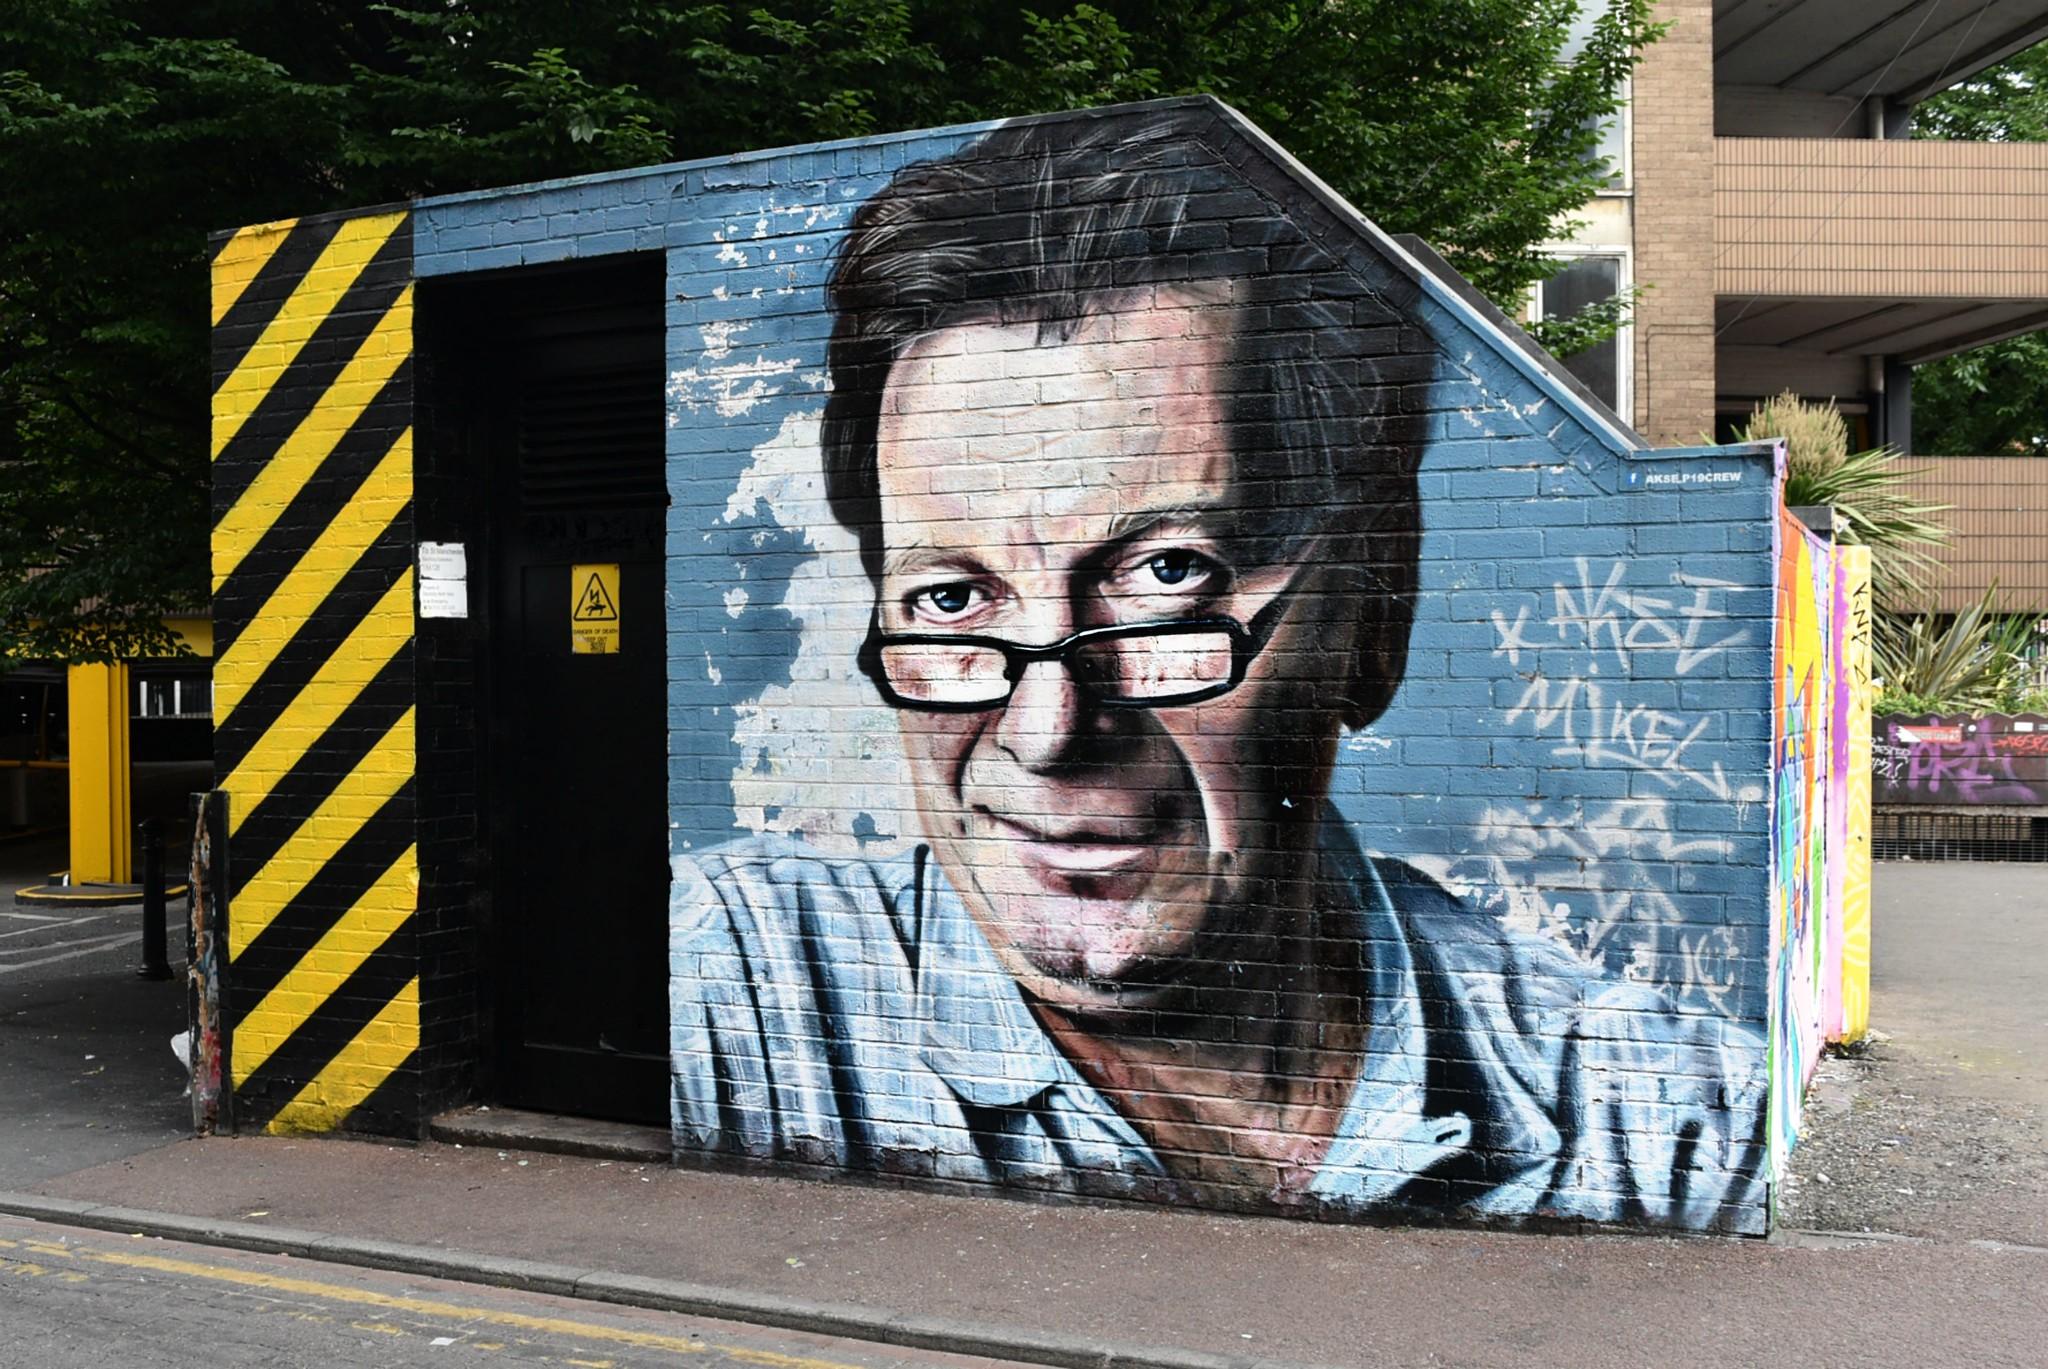 Tony Wilson artwork in Manchester